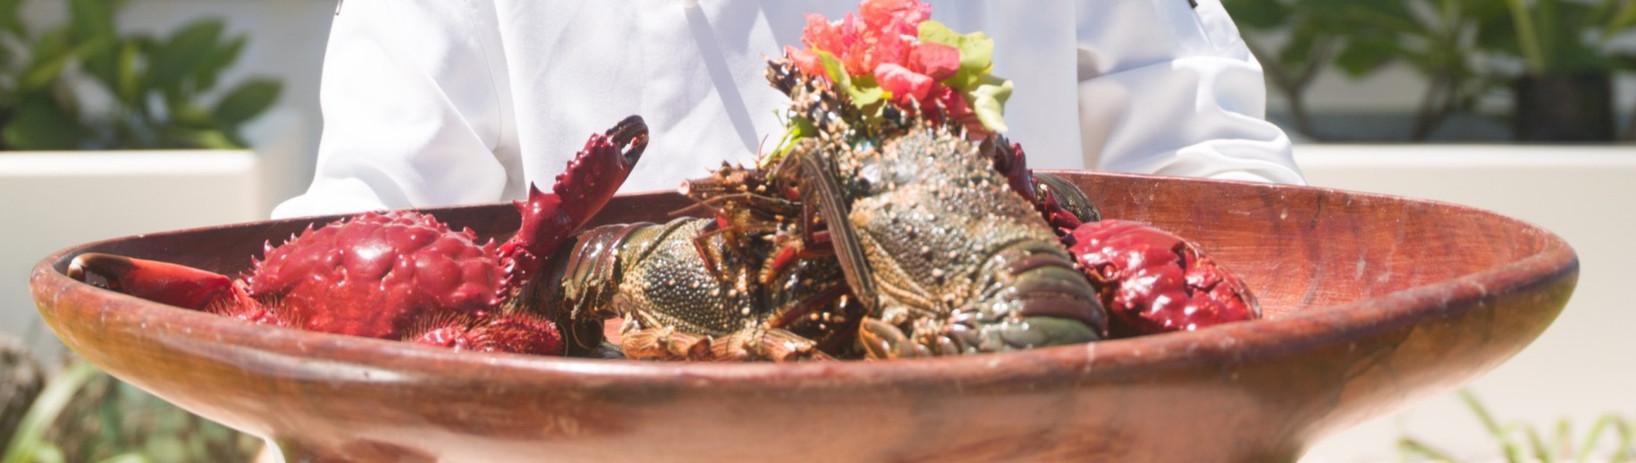 Local lobster and crab at Tamanu.jpg